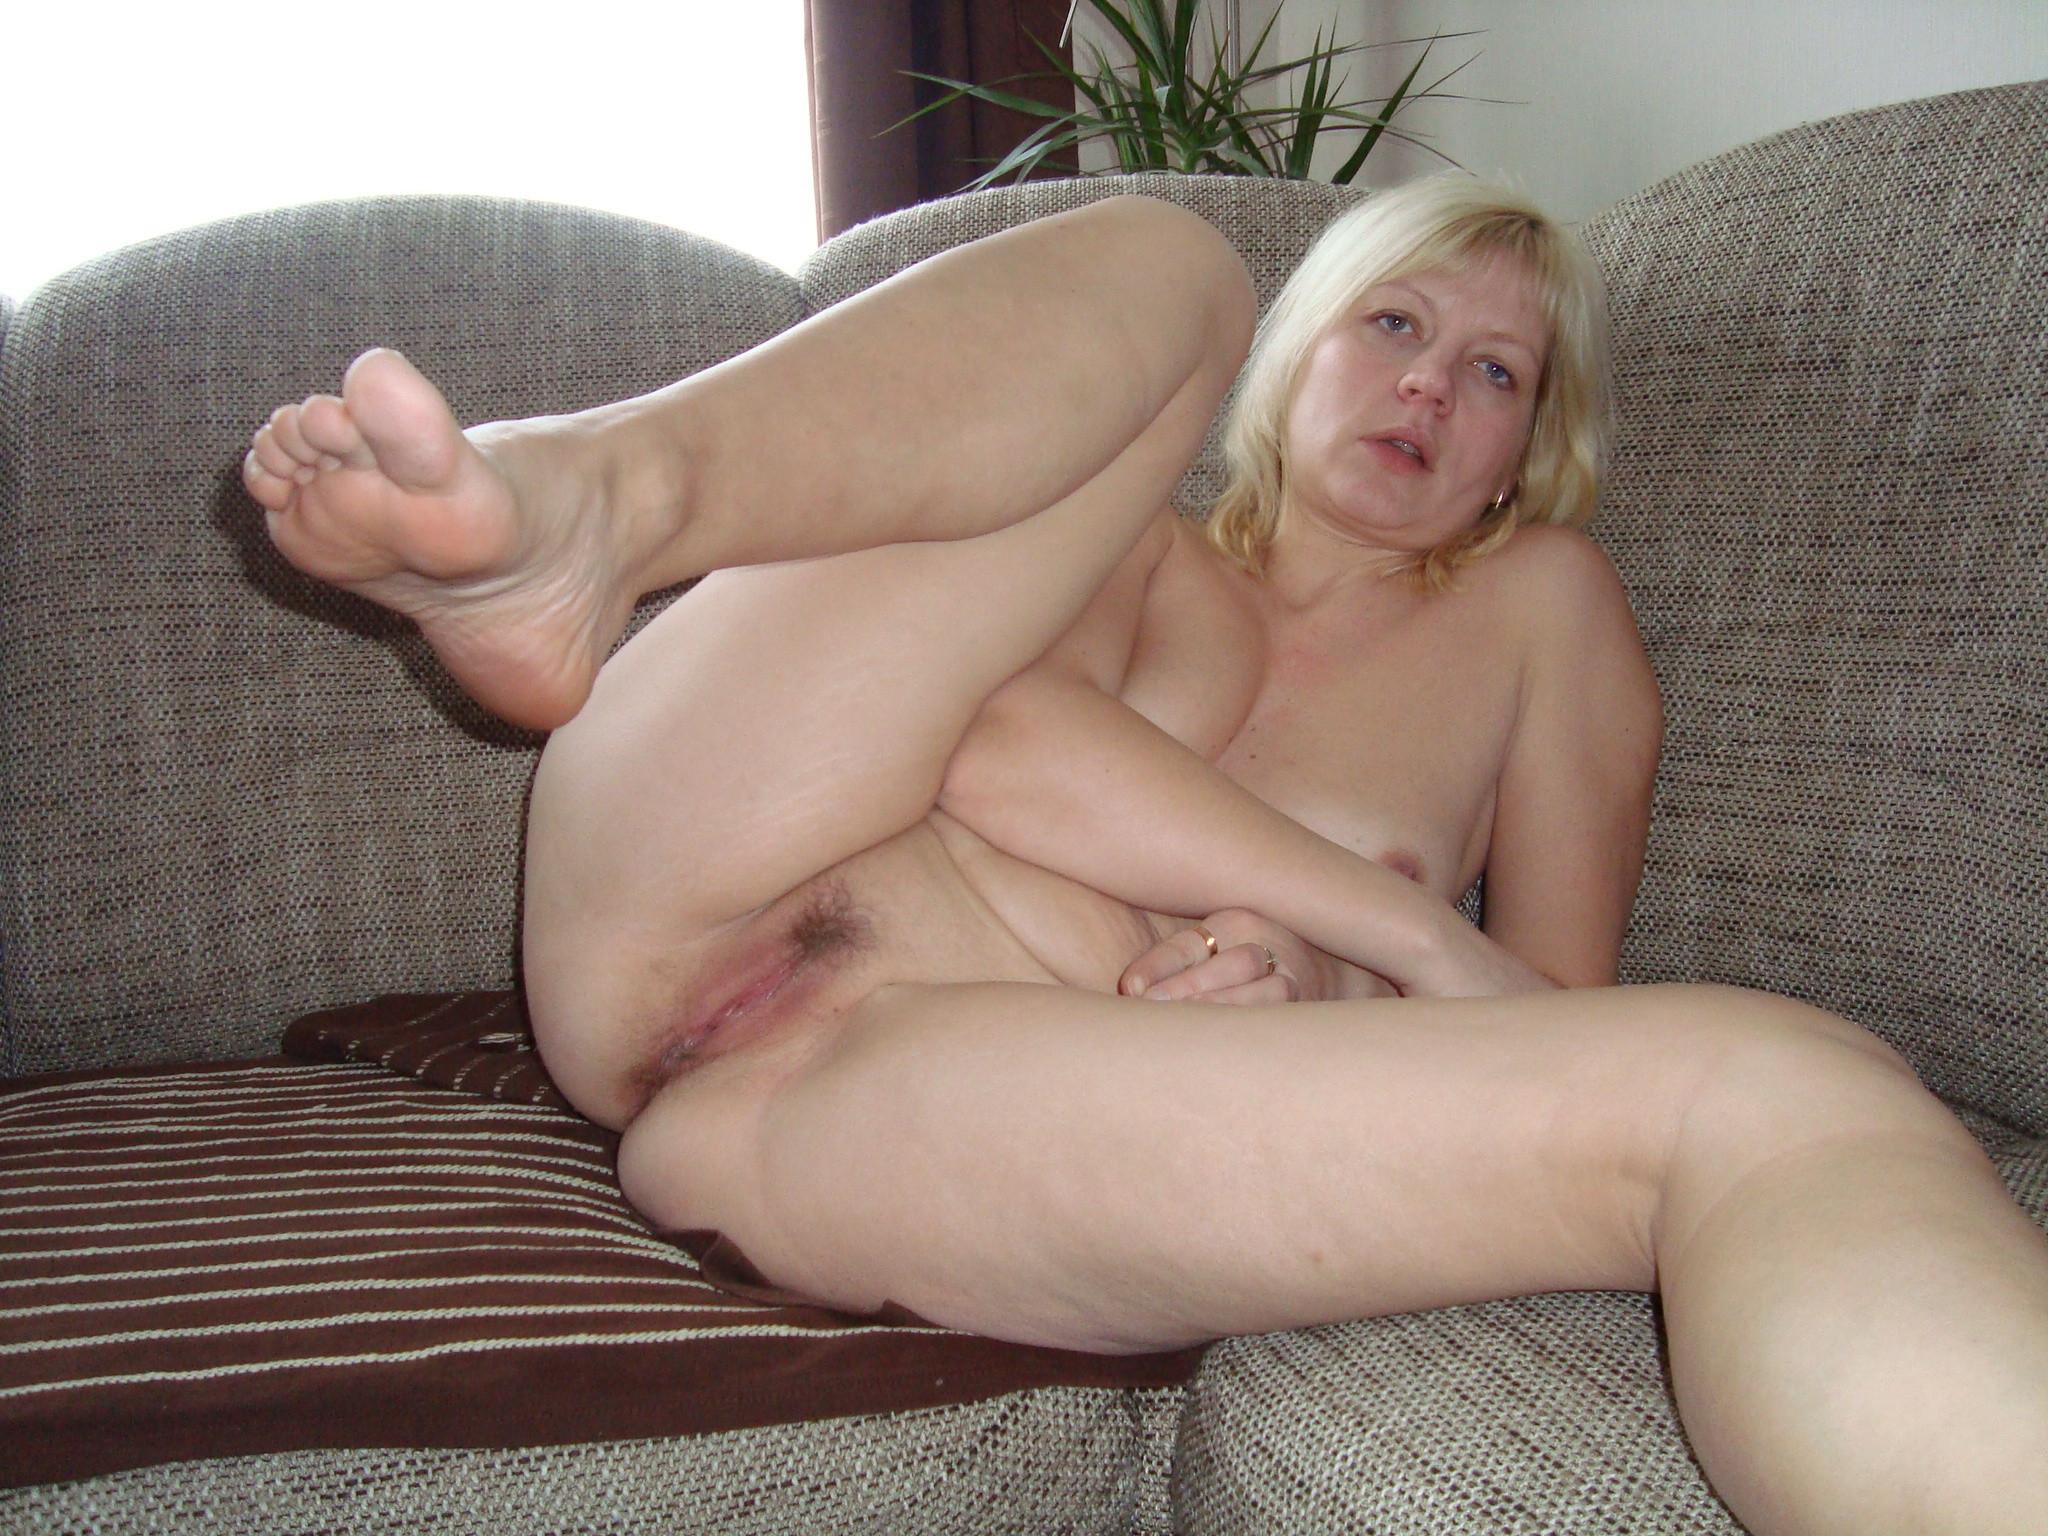 Big Ass Tits Mature Fat Porn Ass Big Fat Mature Porn Tit Amateur Mature Porn